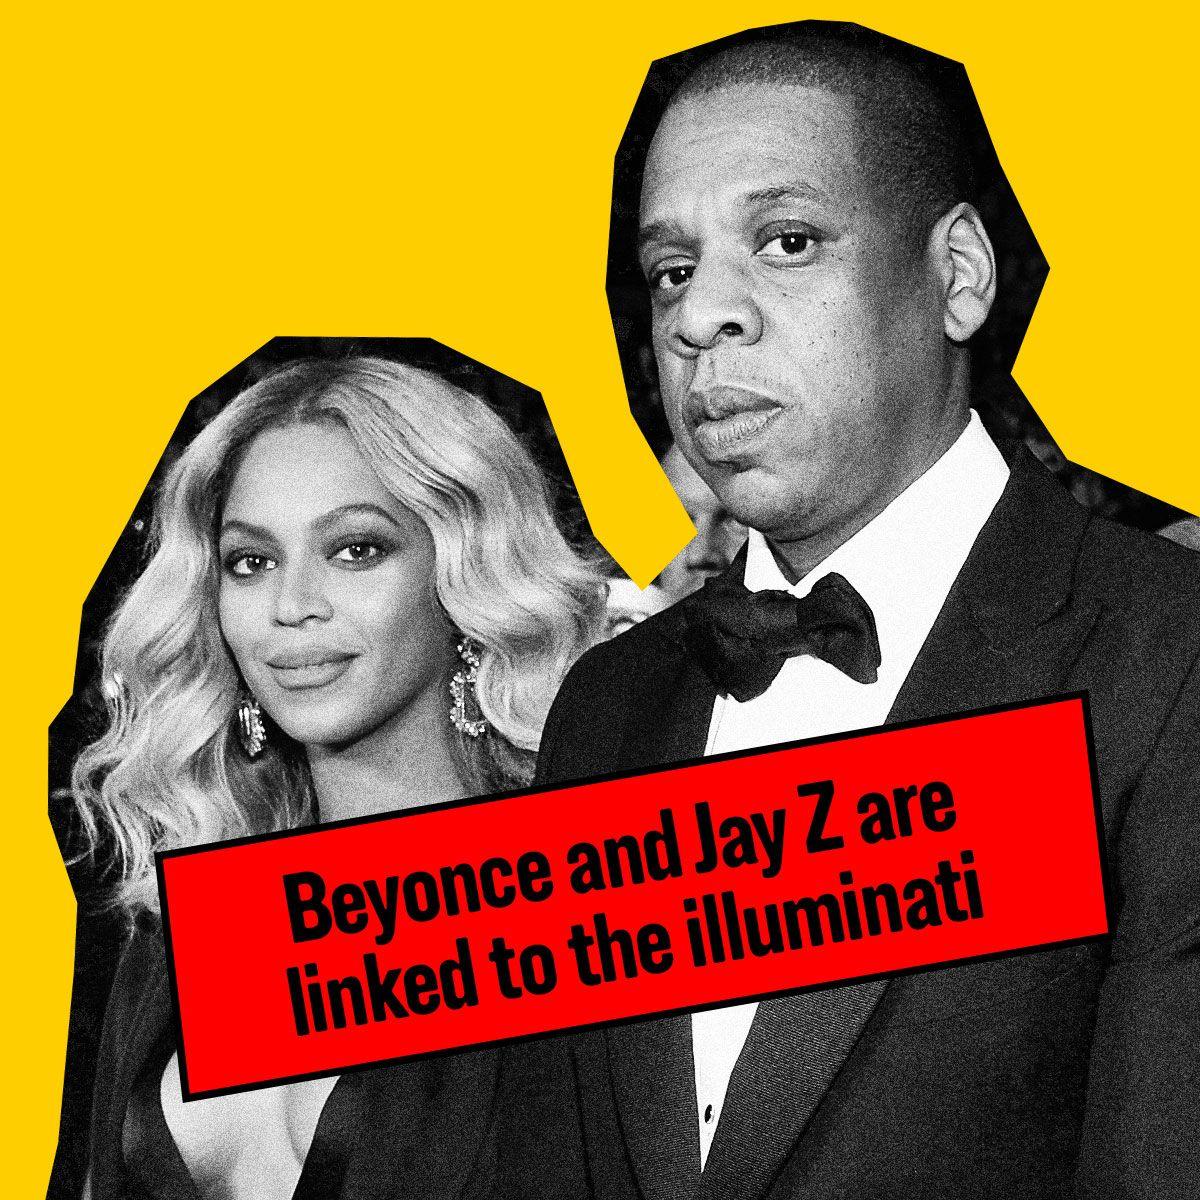 Ladies lyrics illuminati single backwards Misheard Song